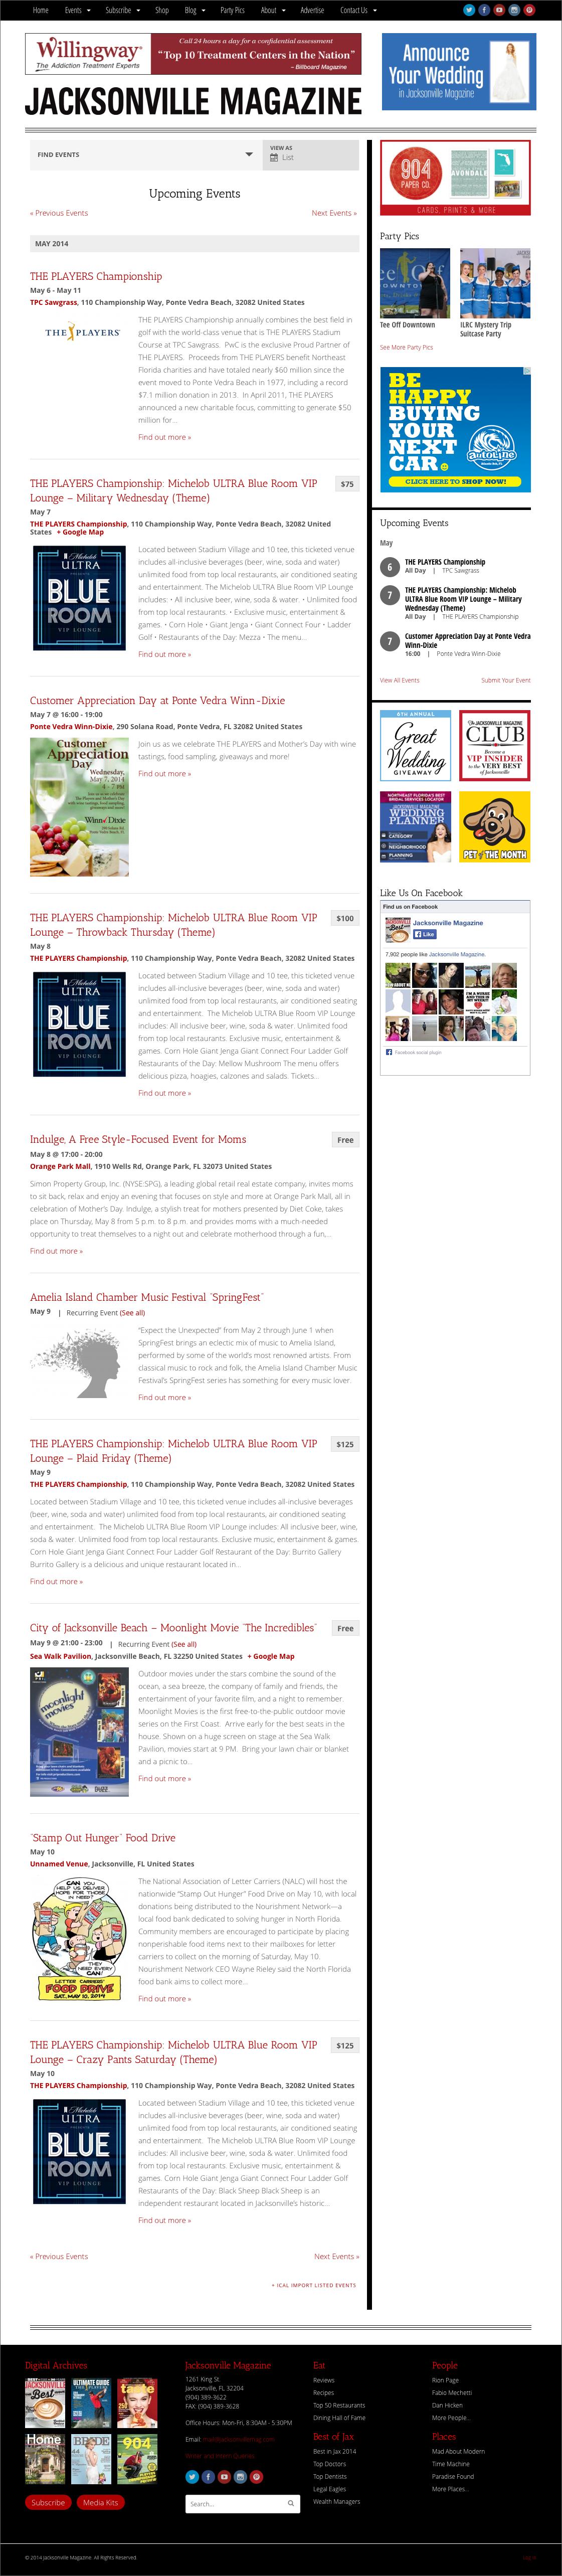 Jacksonville Magazine website screenshot - Upcoming Events